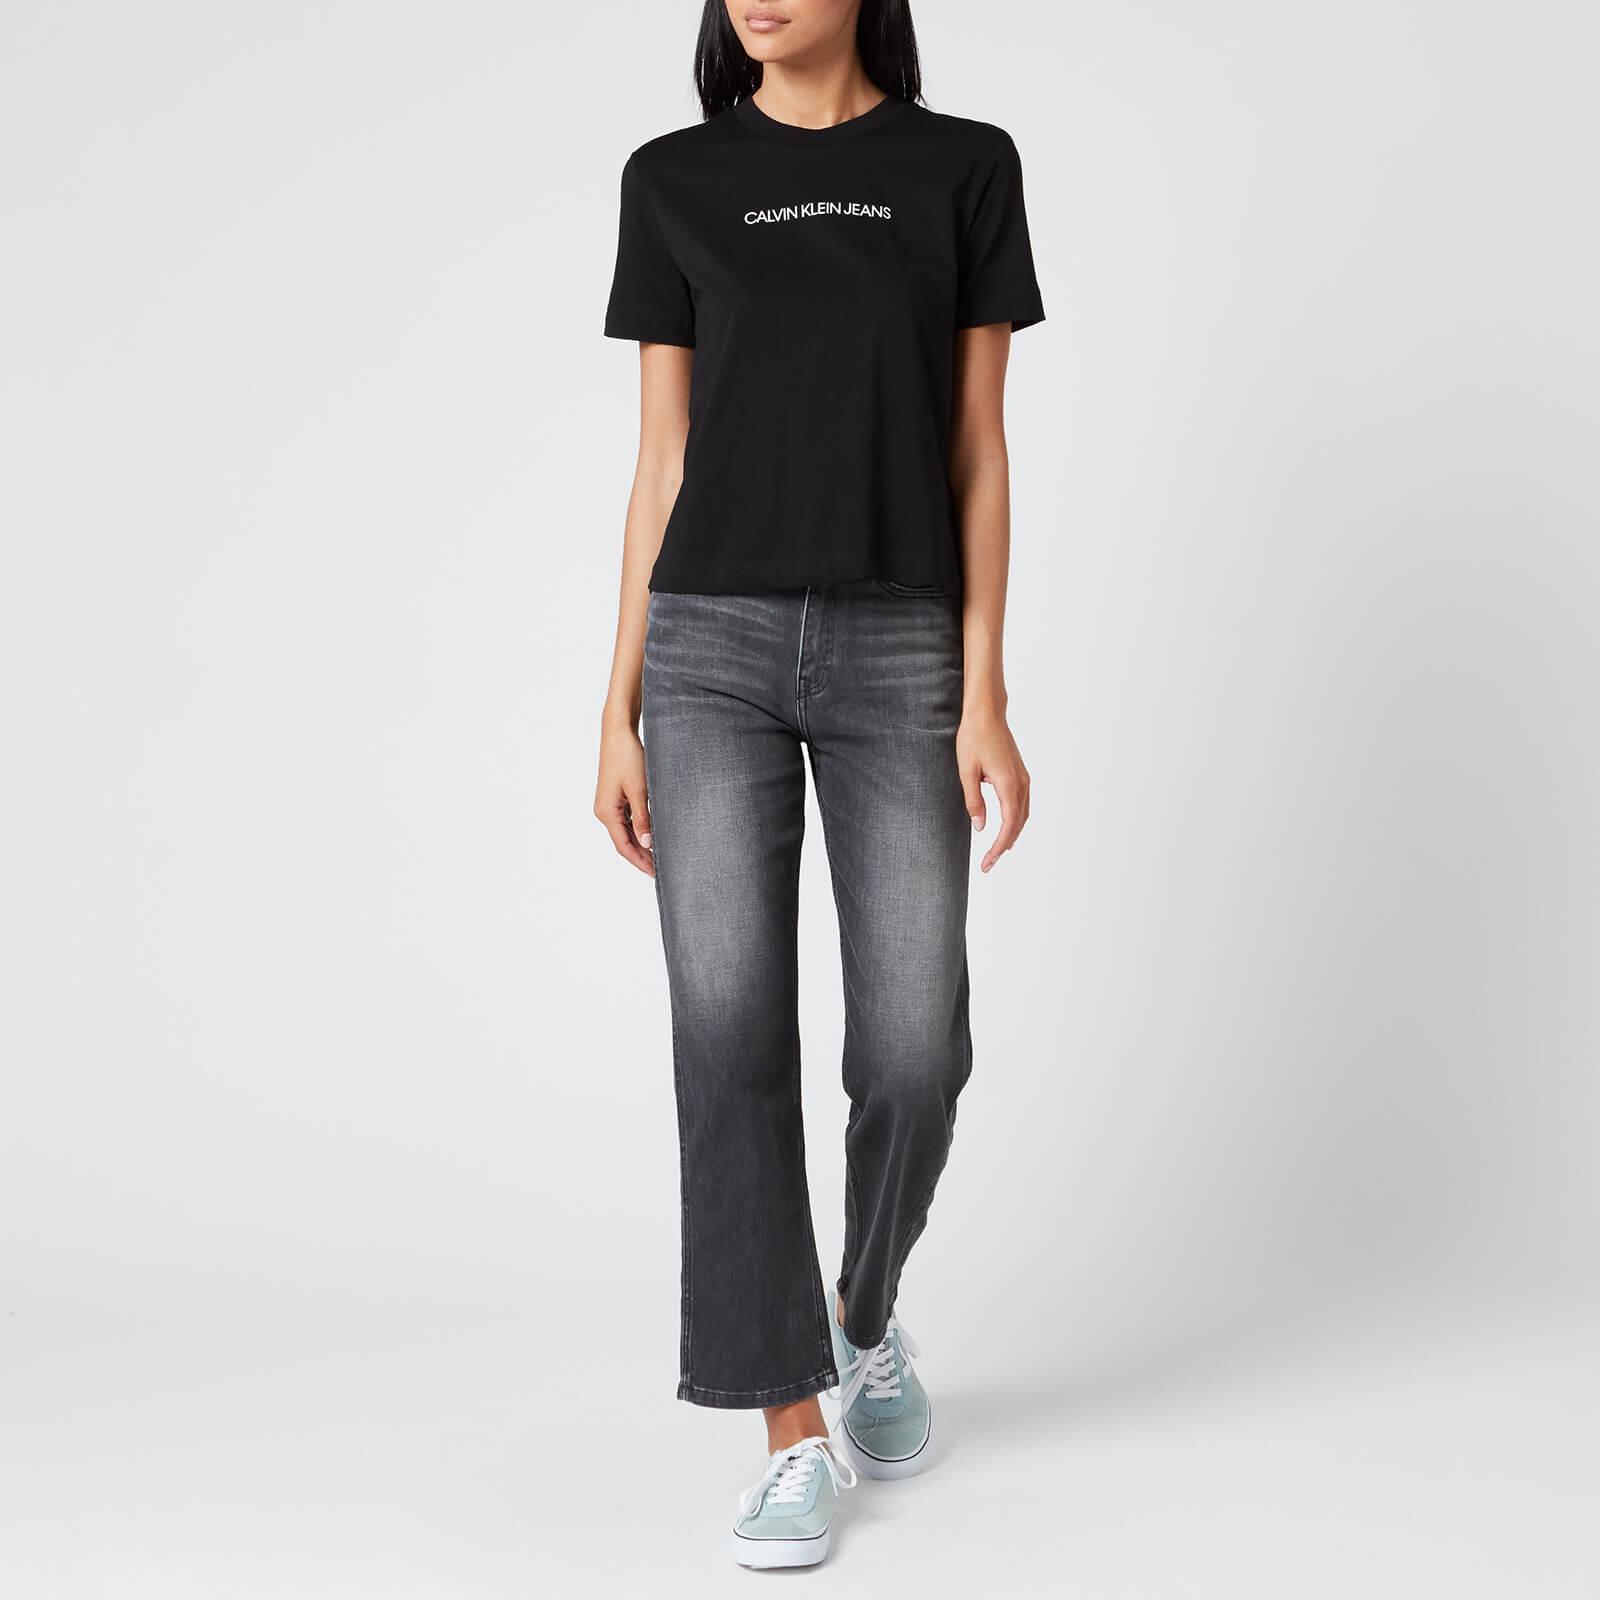 Calvin Klein Jeans Women's Shrunken Institutional T-Shirt - Ck Black - Xs